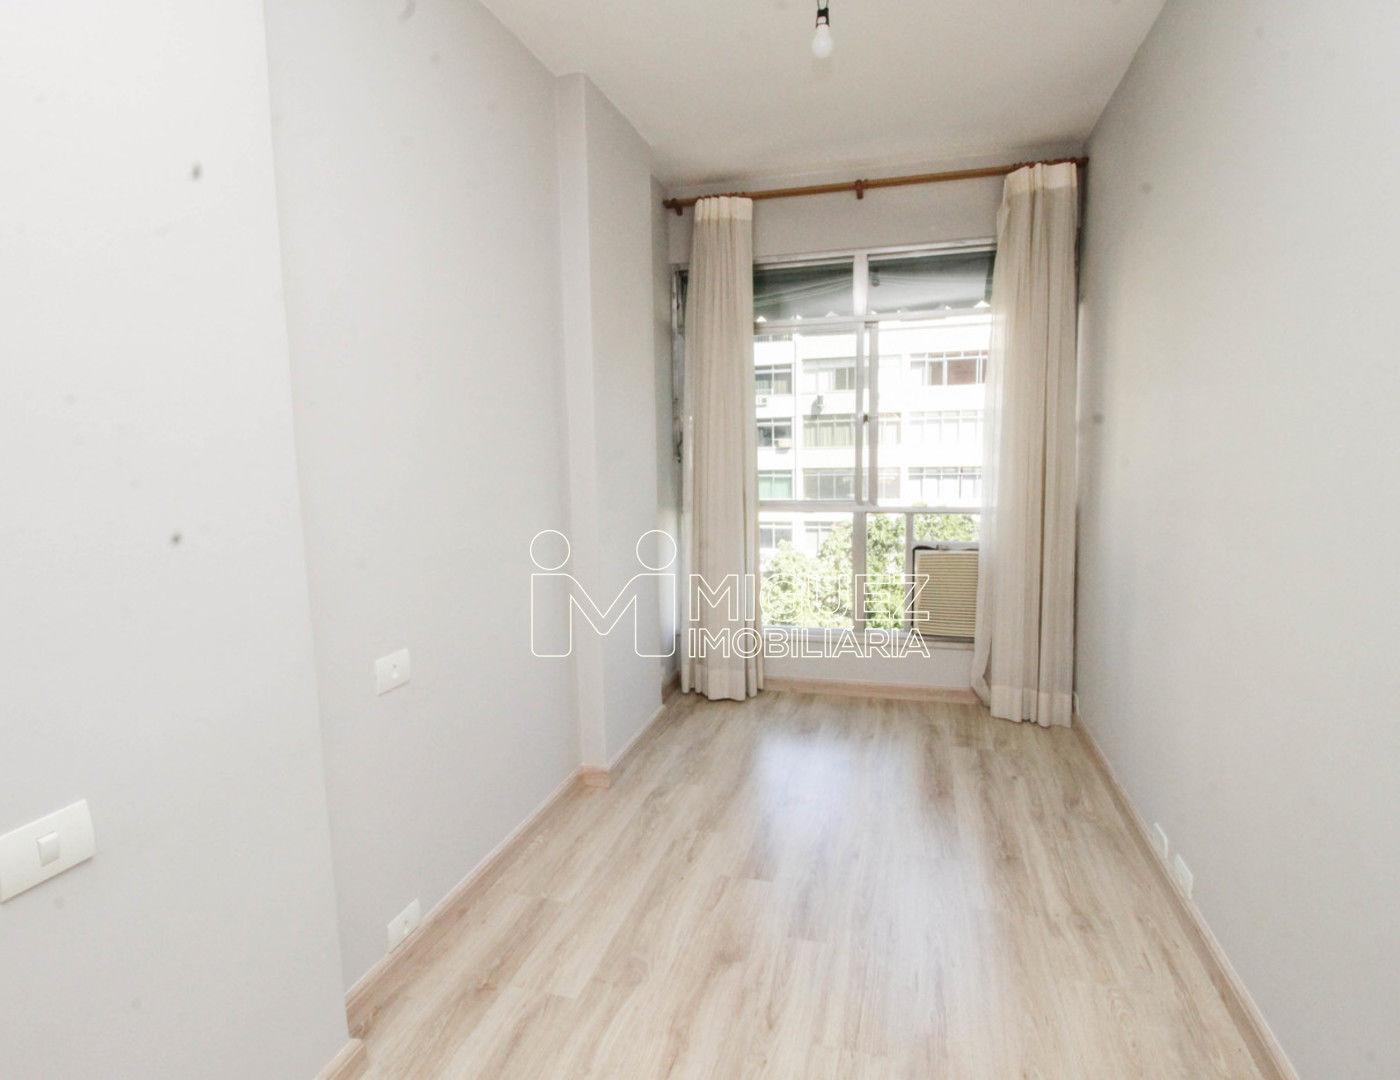 Apartamento, venda, Rua Uruguai - Tijuca , Rio de janeiro